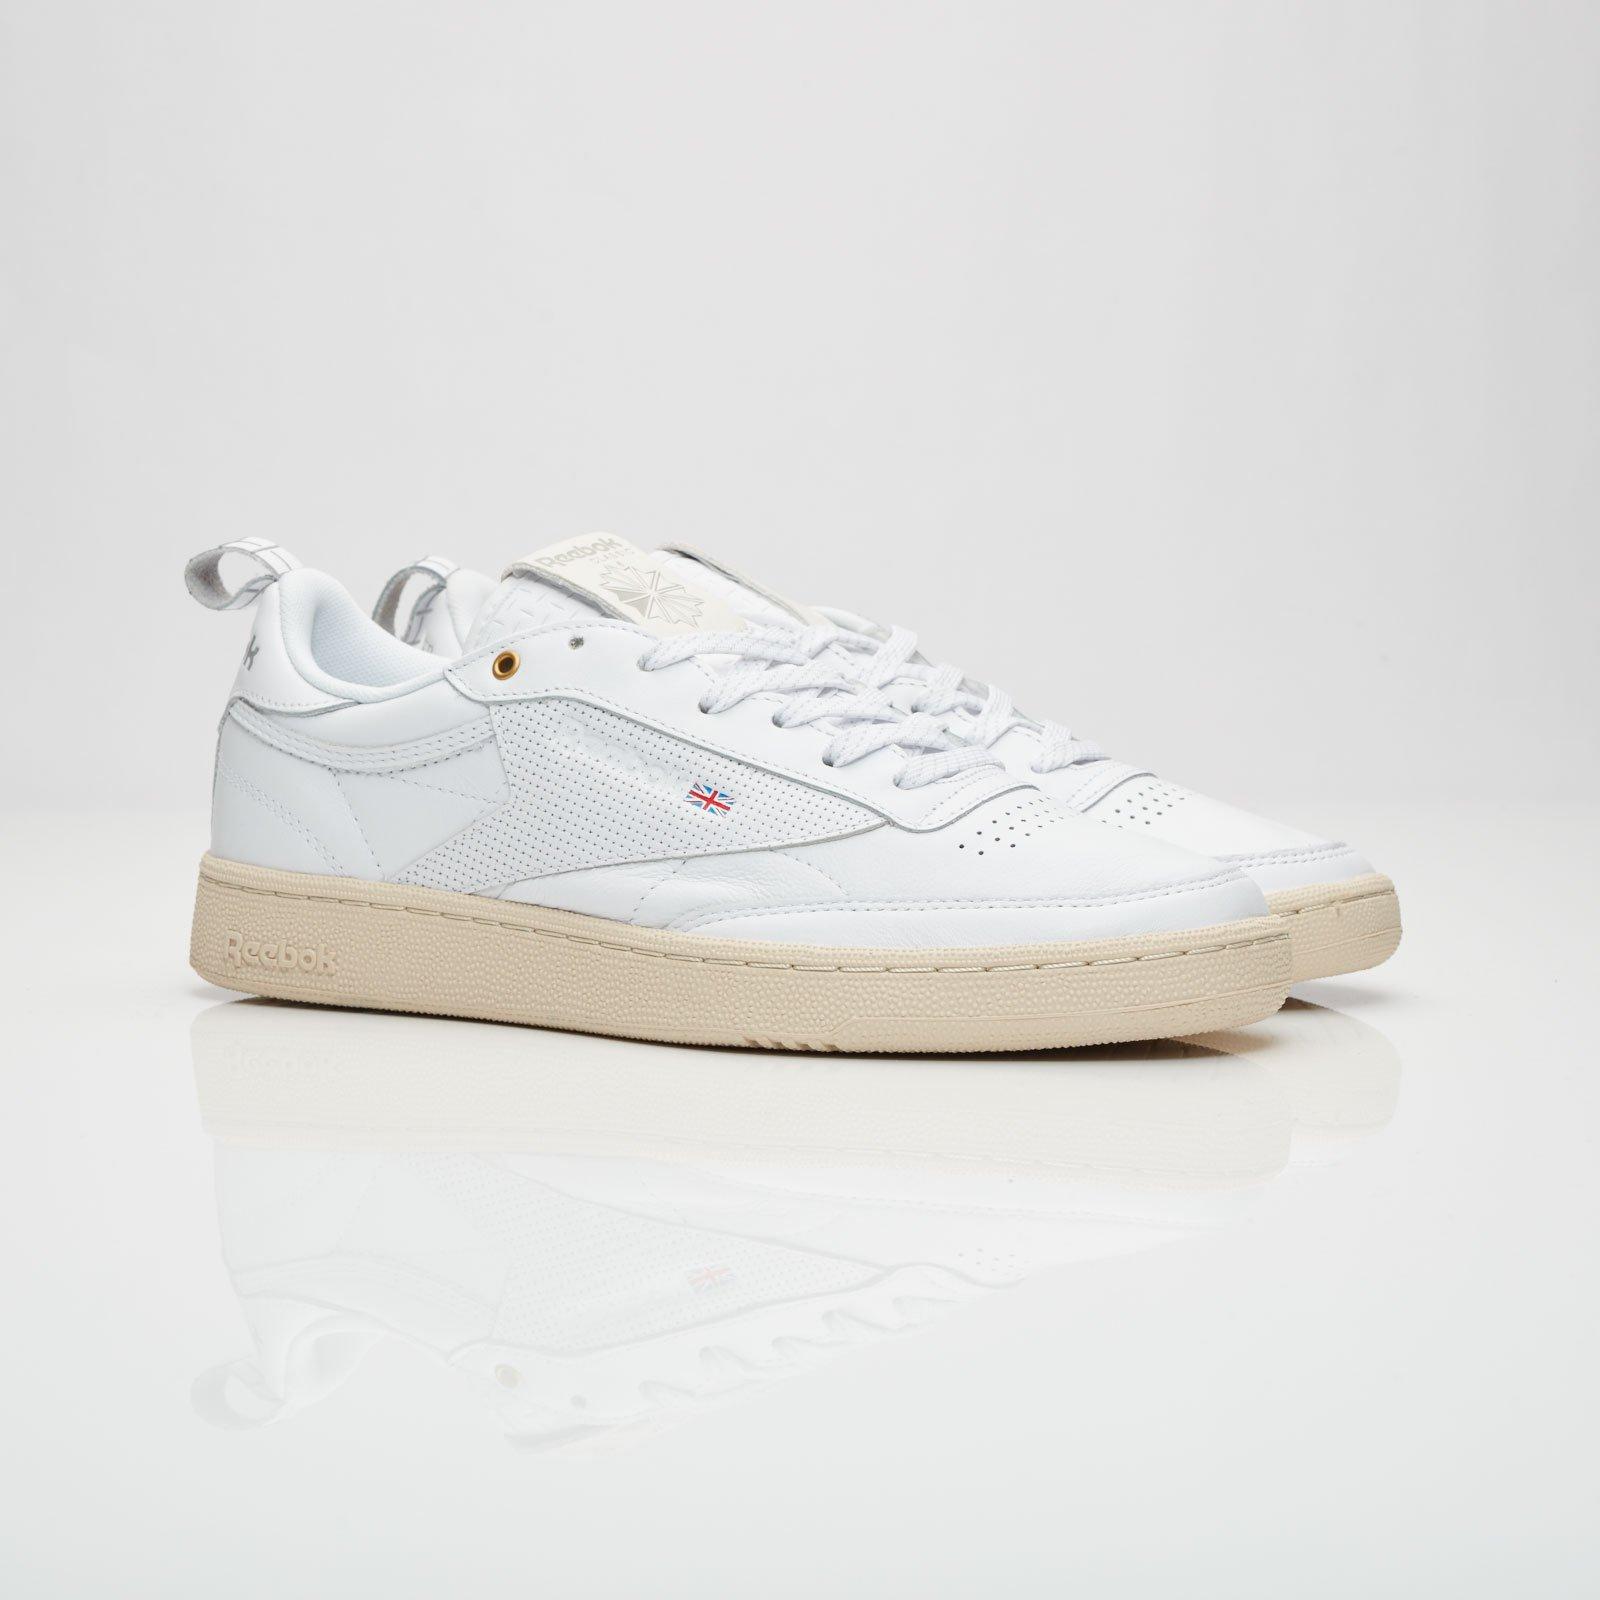 c02452fd0ac Reebok Club C CNL x Crossover - Ar3754 - Sneakersnstuff